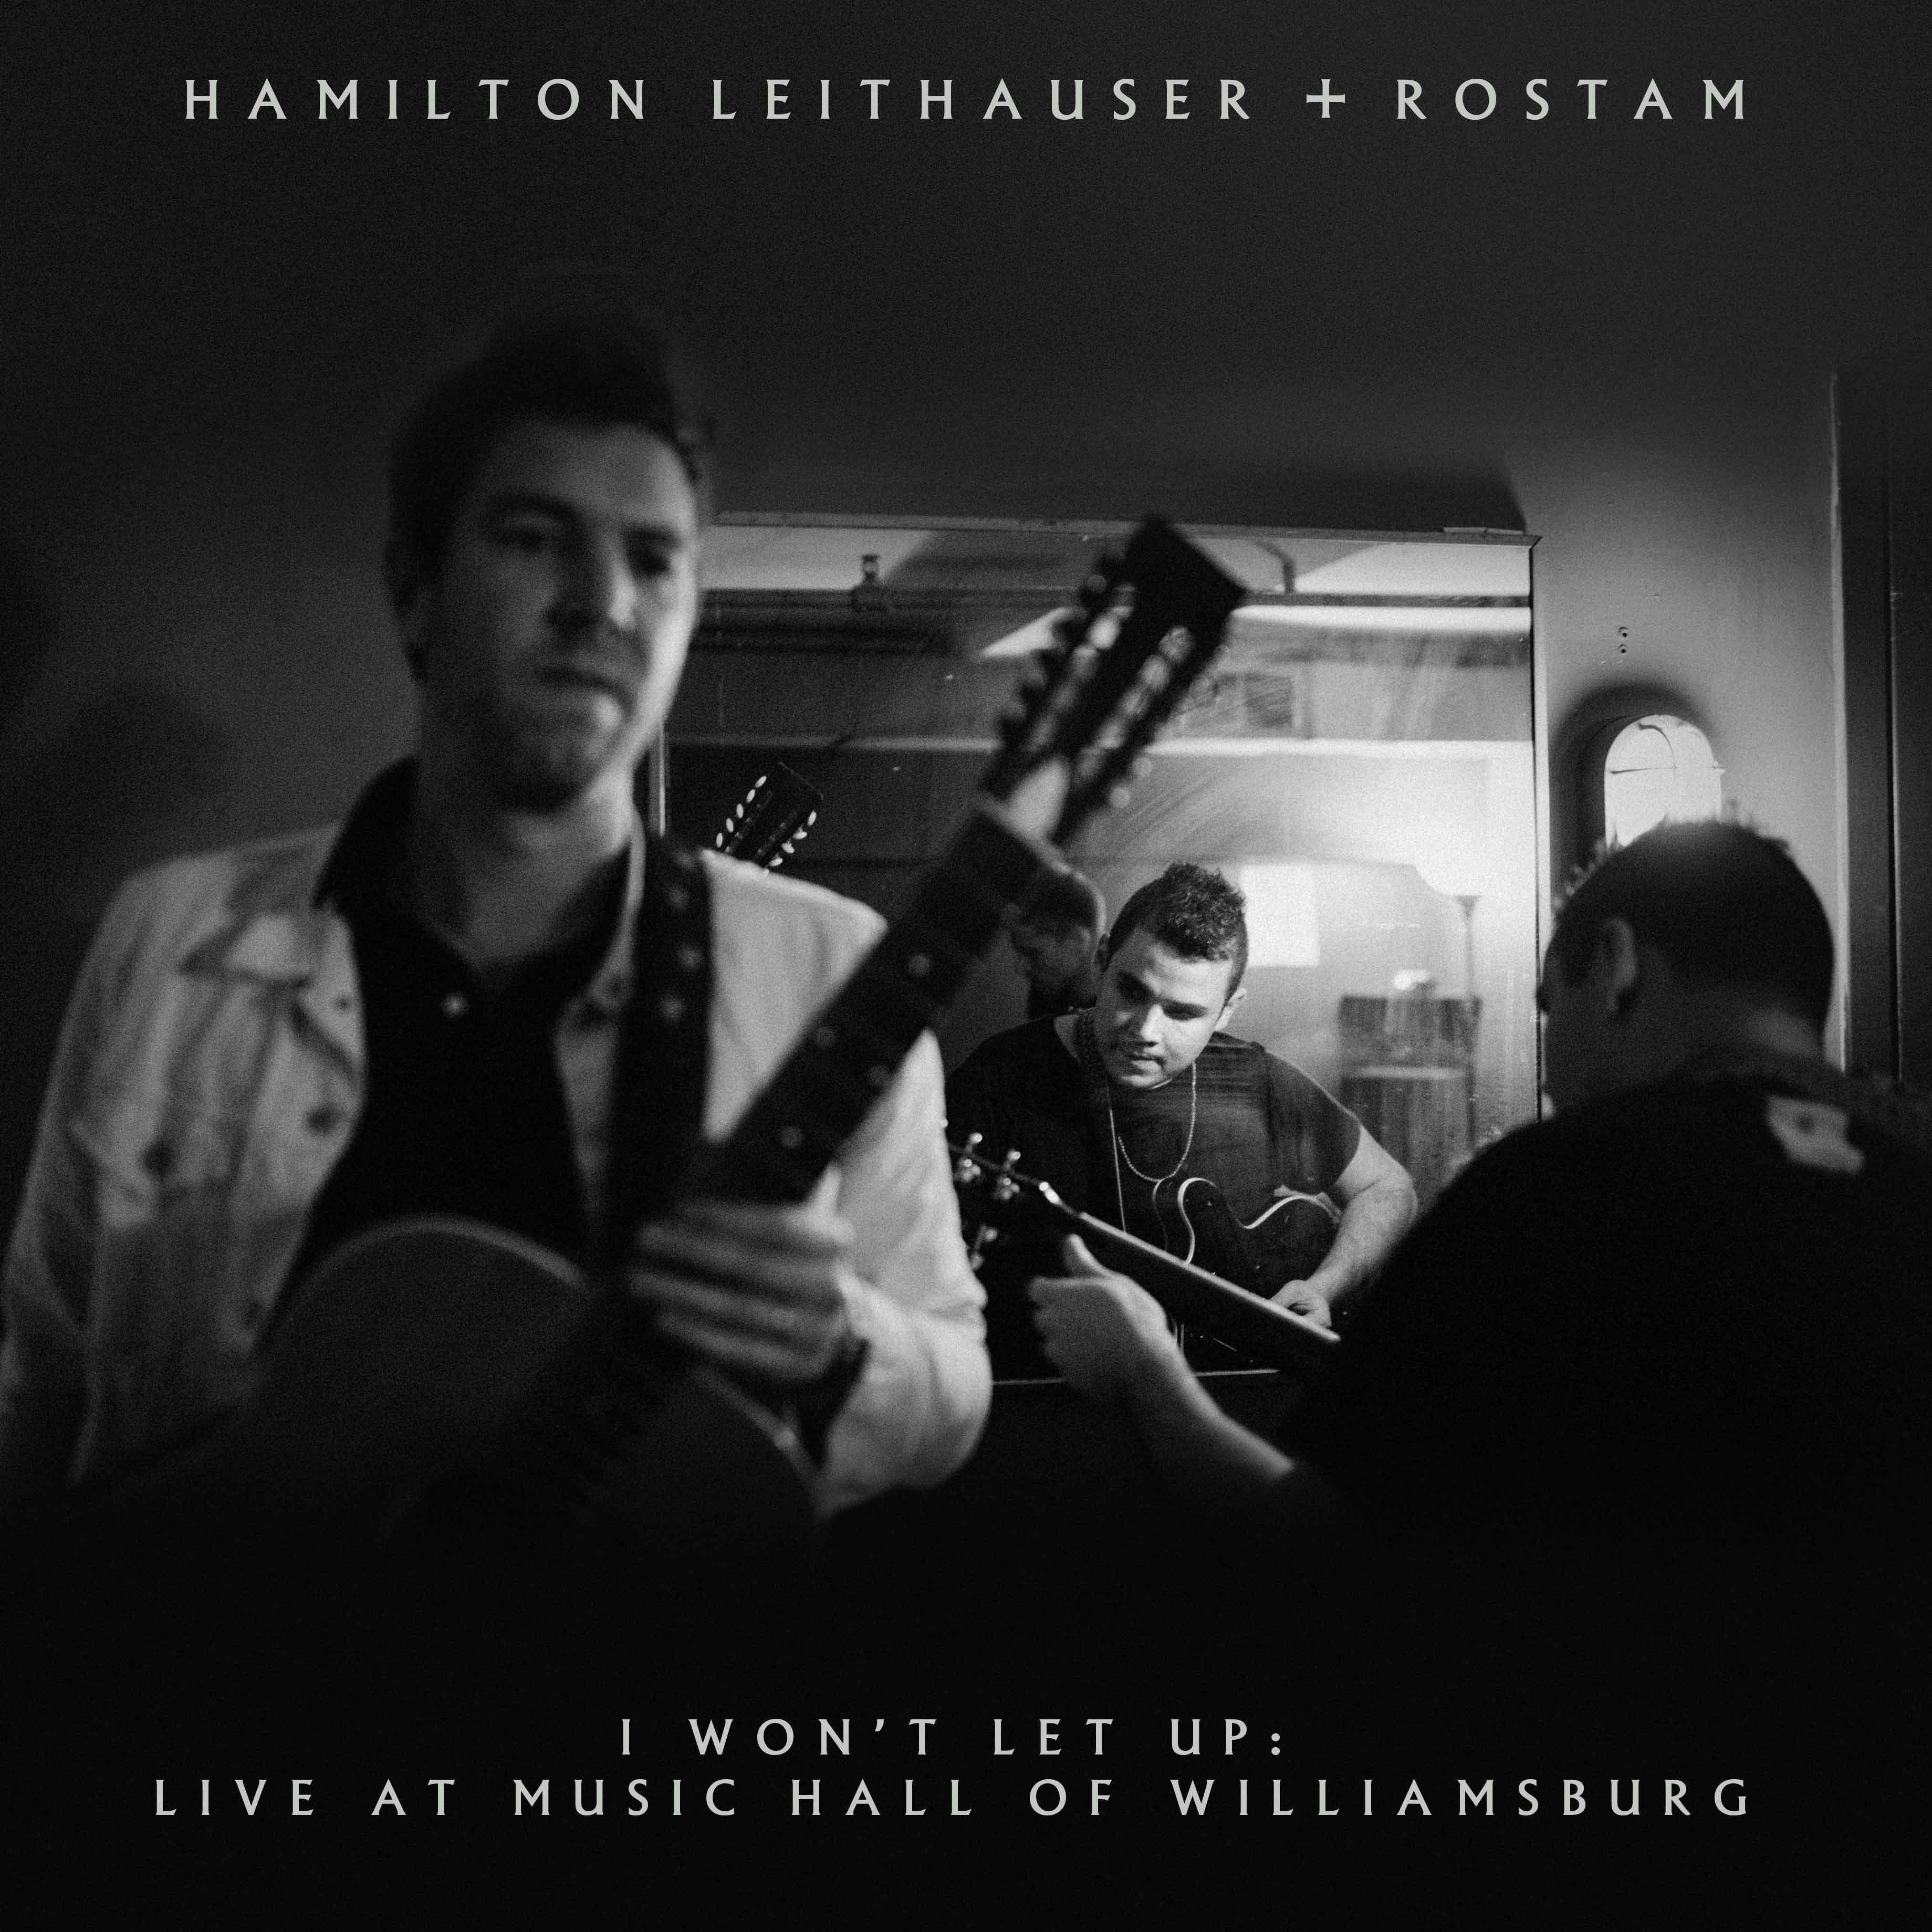 unnamed 26 Hamilton Leithauser + Rostam announce vinyl live album, I Won't Let Up: Live at Music Hall of Williamsburg